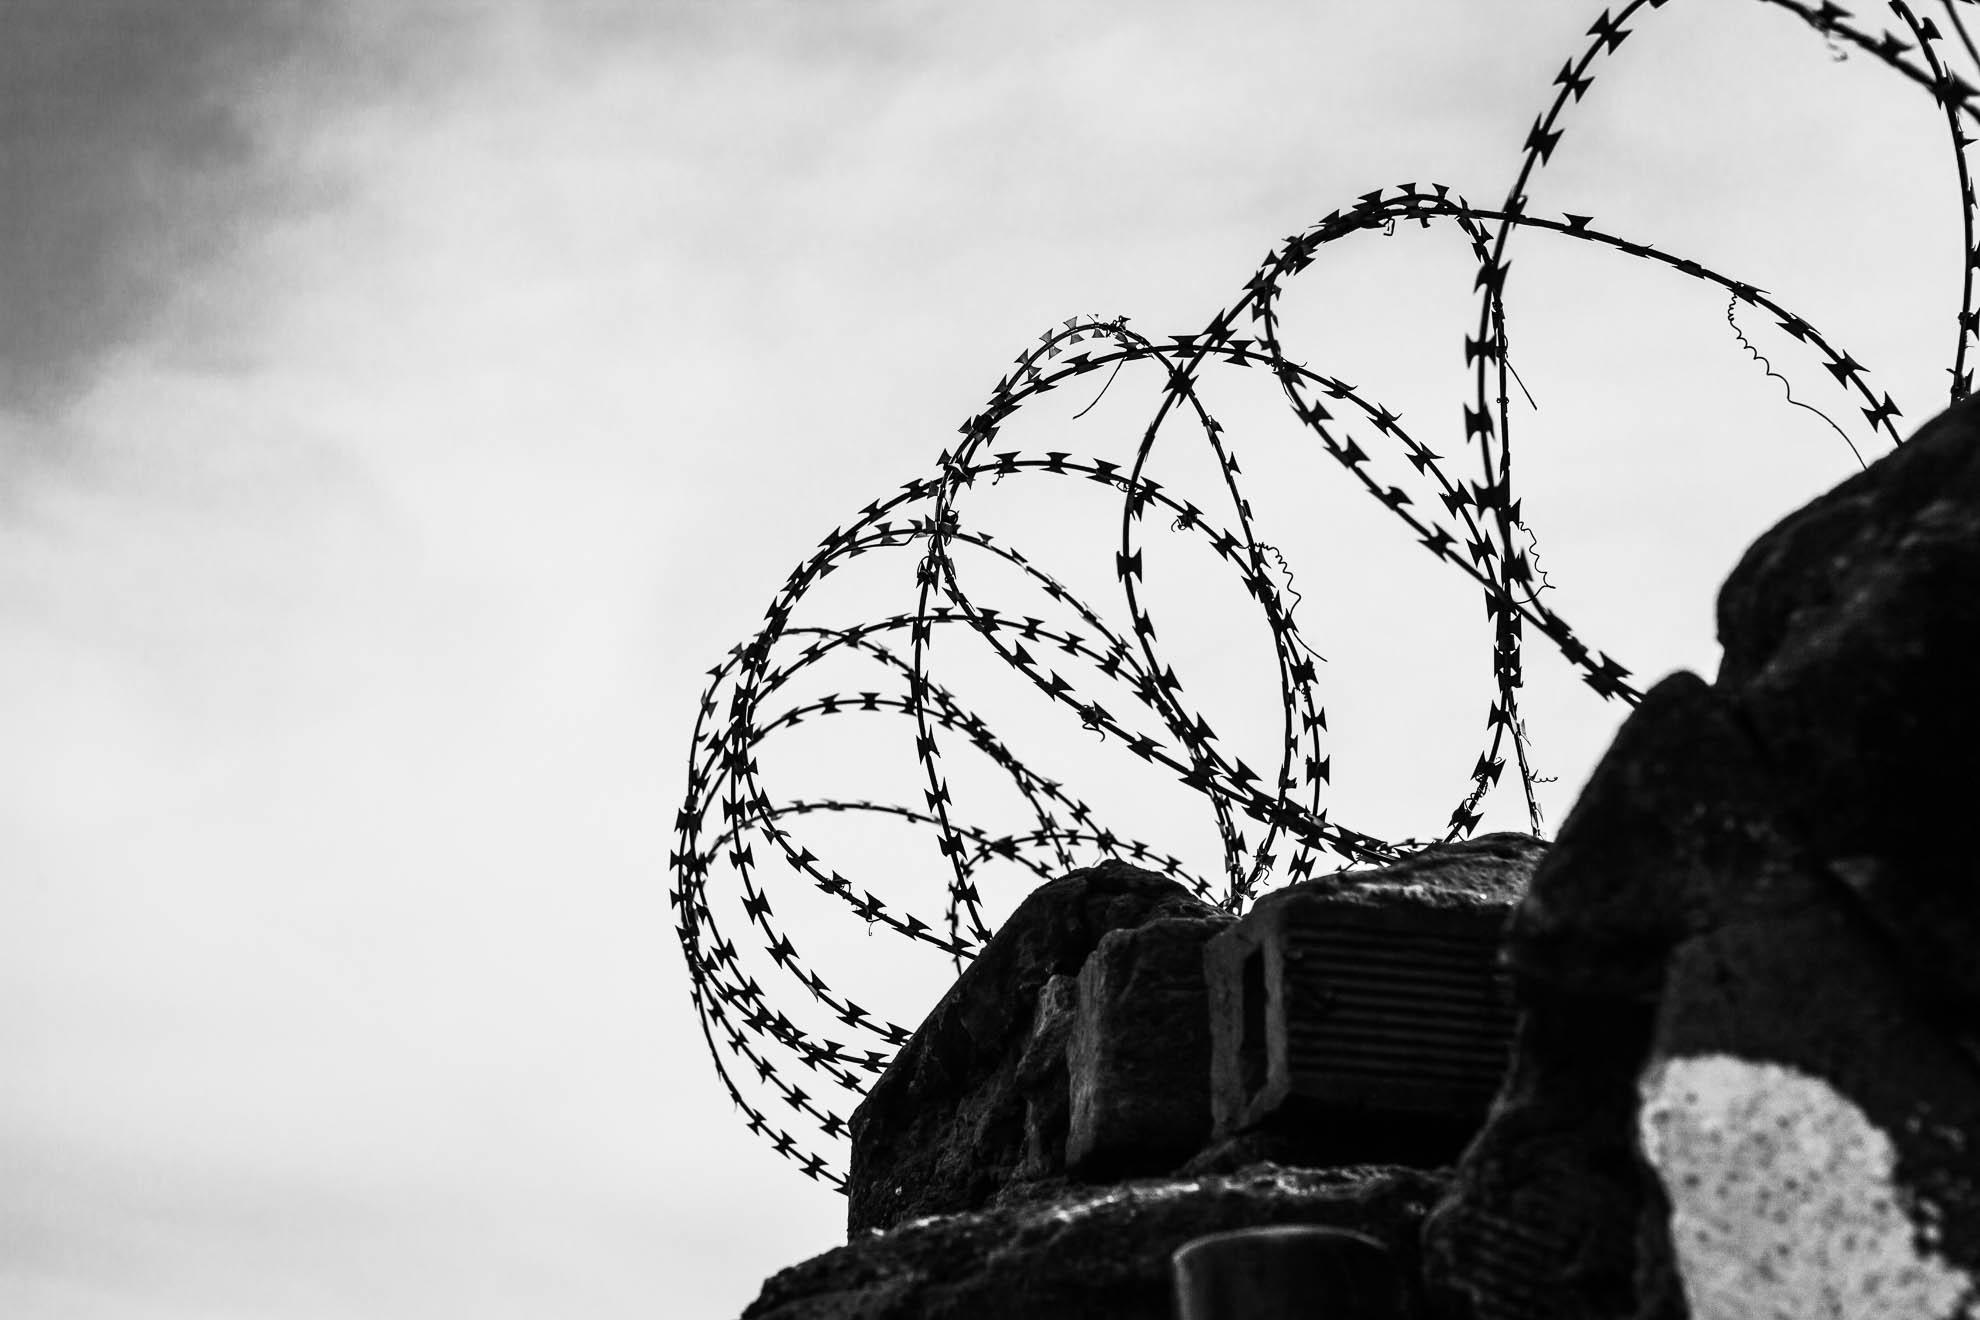 death penalty, photography, photos, execution, prison, documentary, death row, uganda, africa